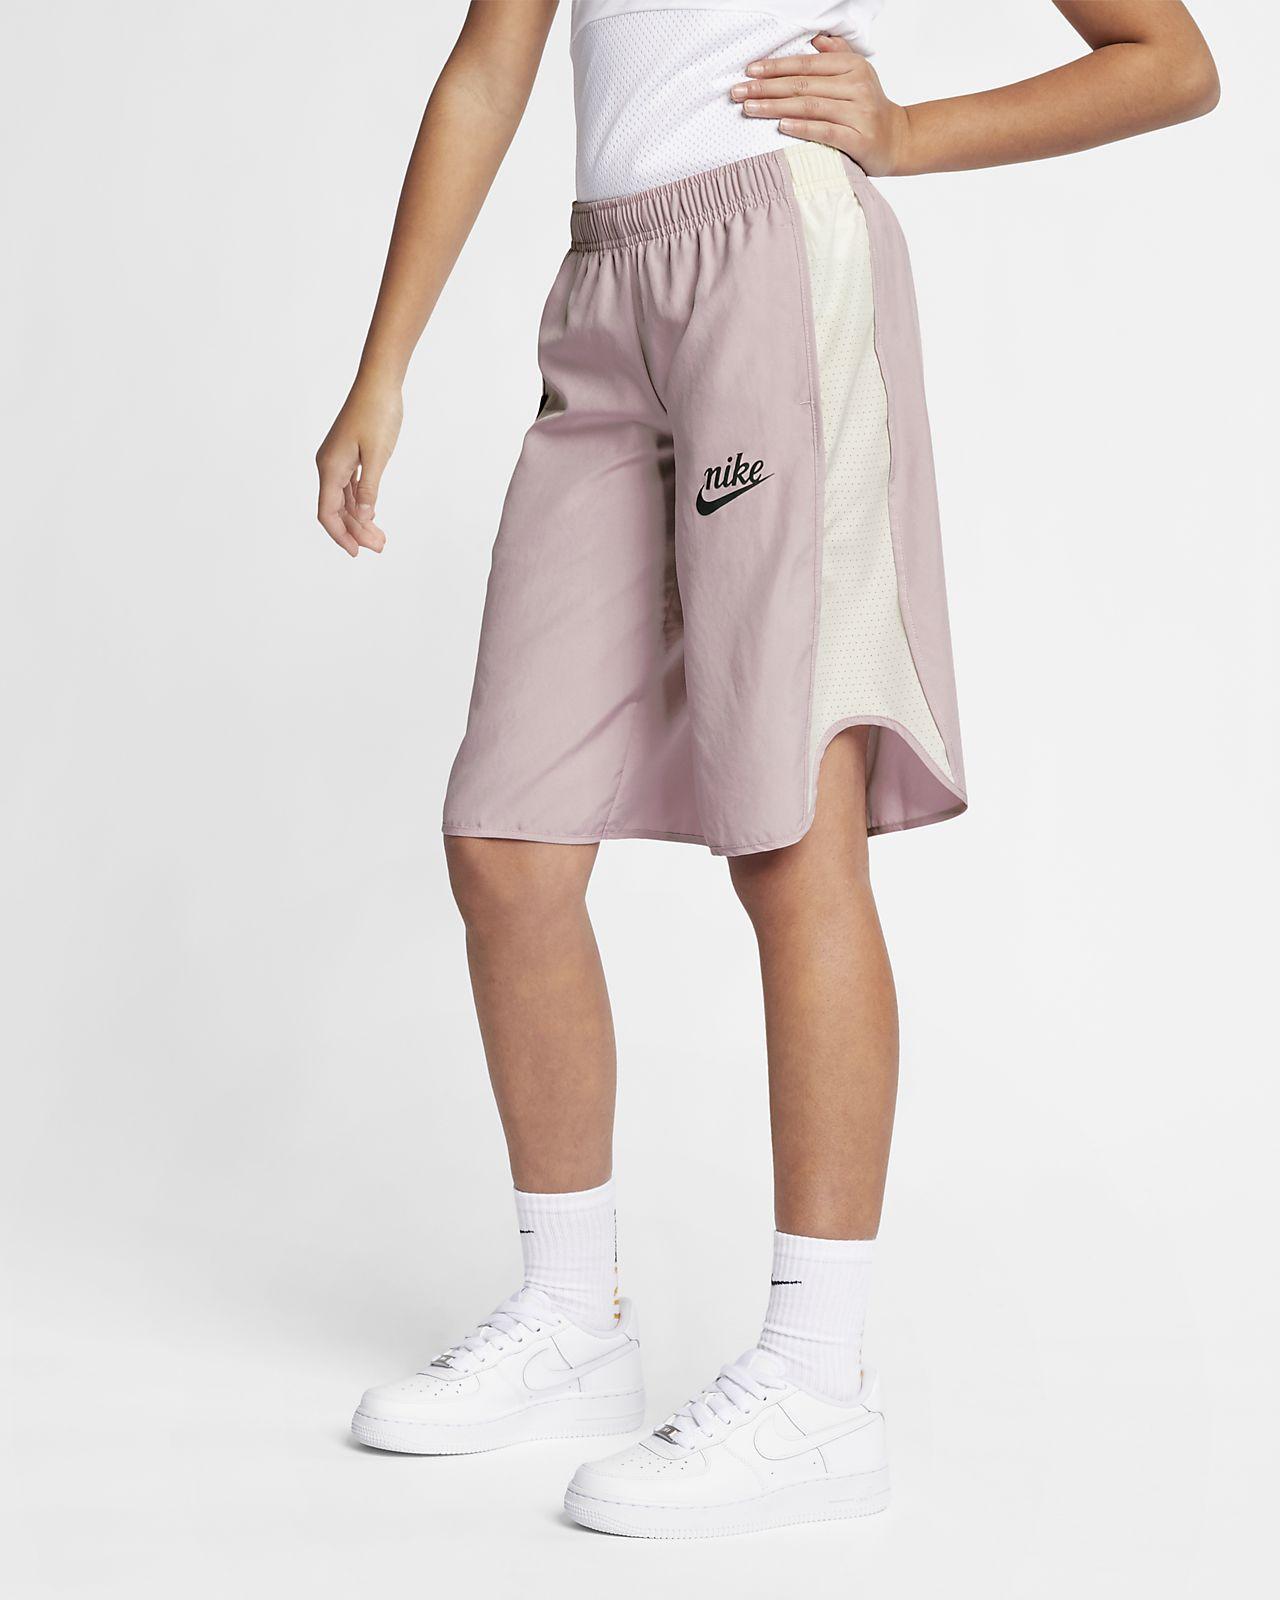 Nike Sportswear Hosenrock für ältere Kinder (Mädchen)